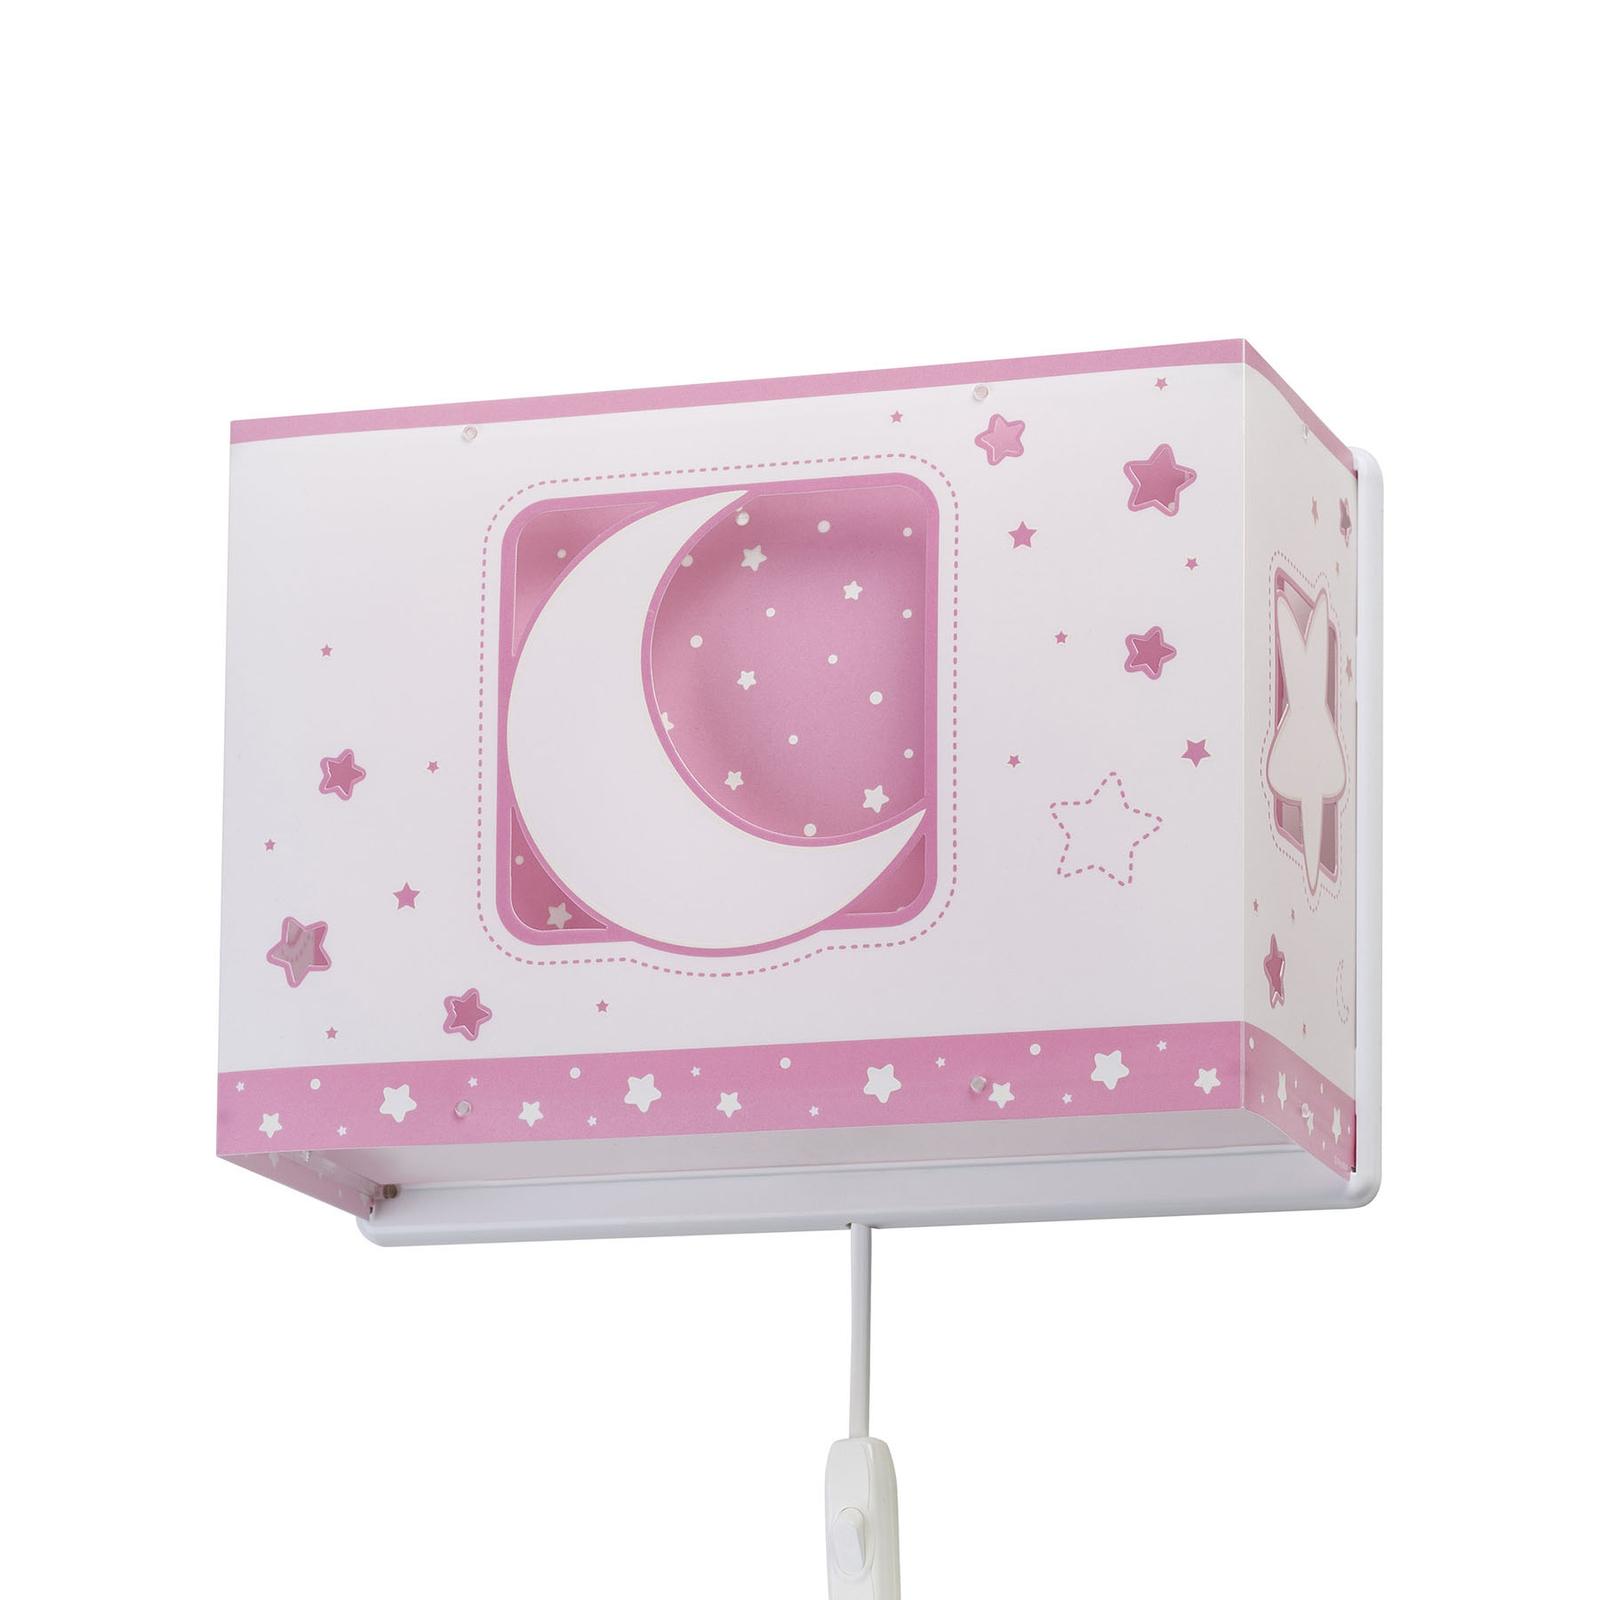 Kinder-Wandleuchte Moonlight mit Stecker, rosa